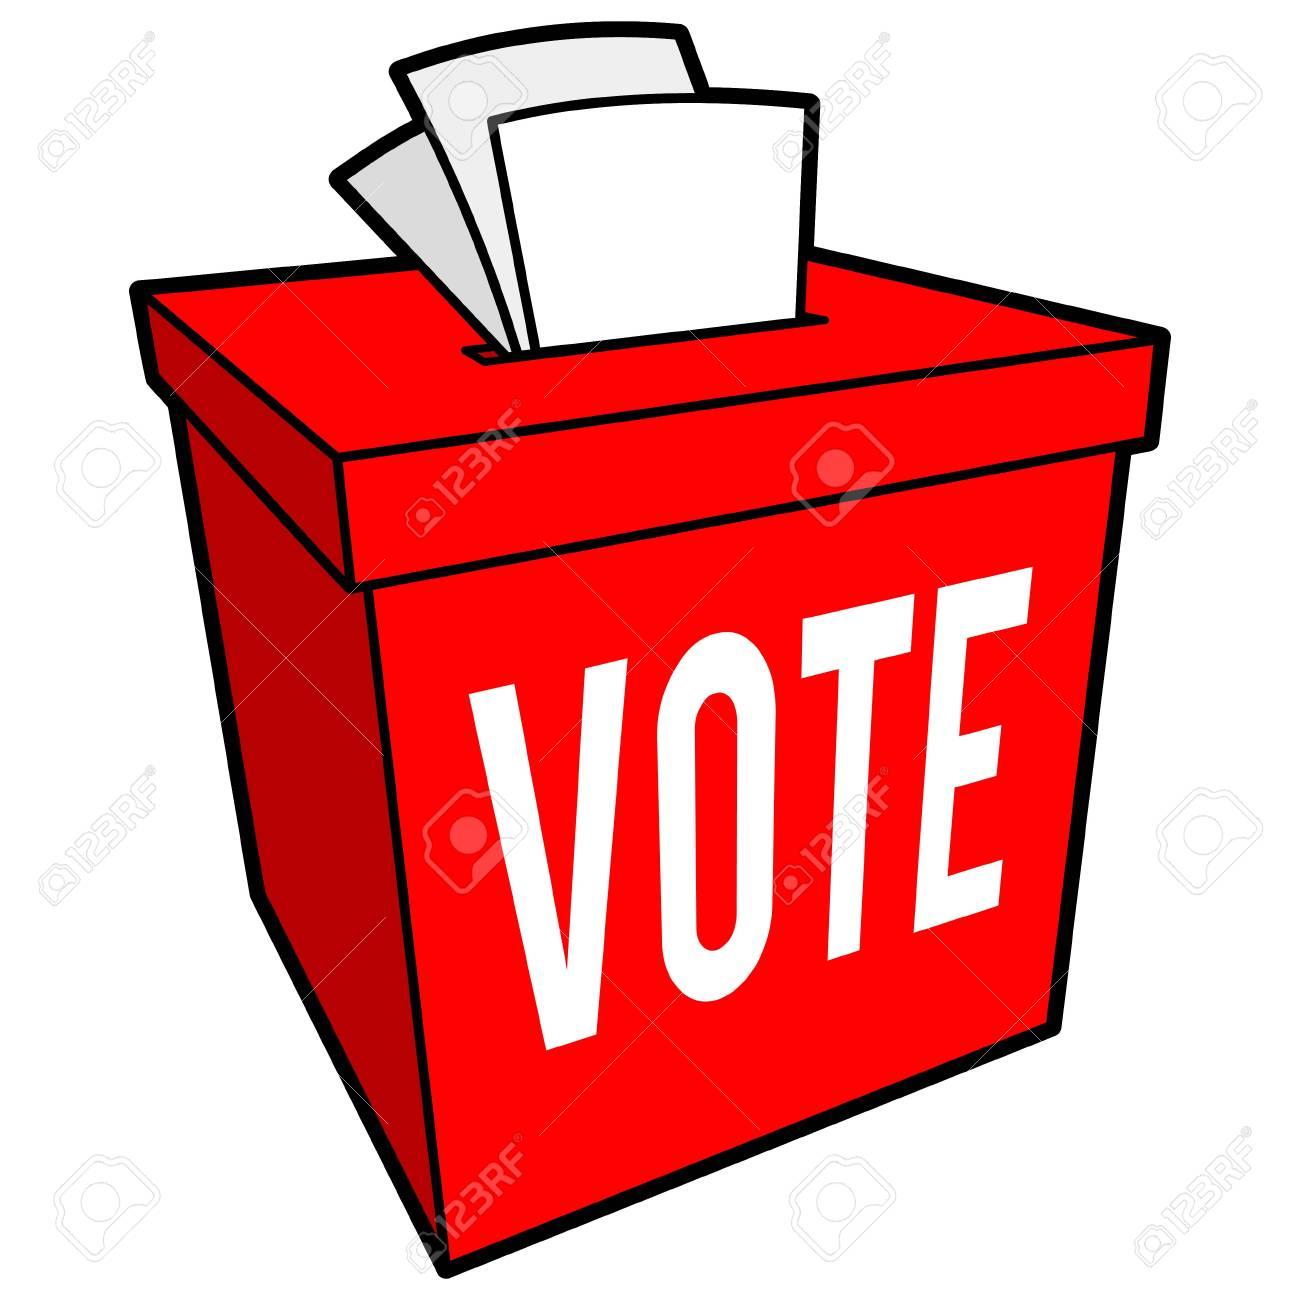 Types of ballot clipart png free stock Ballot box clipart 2 » Clipart Station png free stock